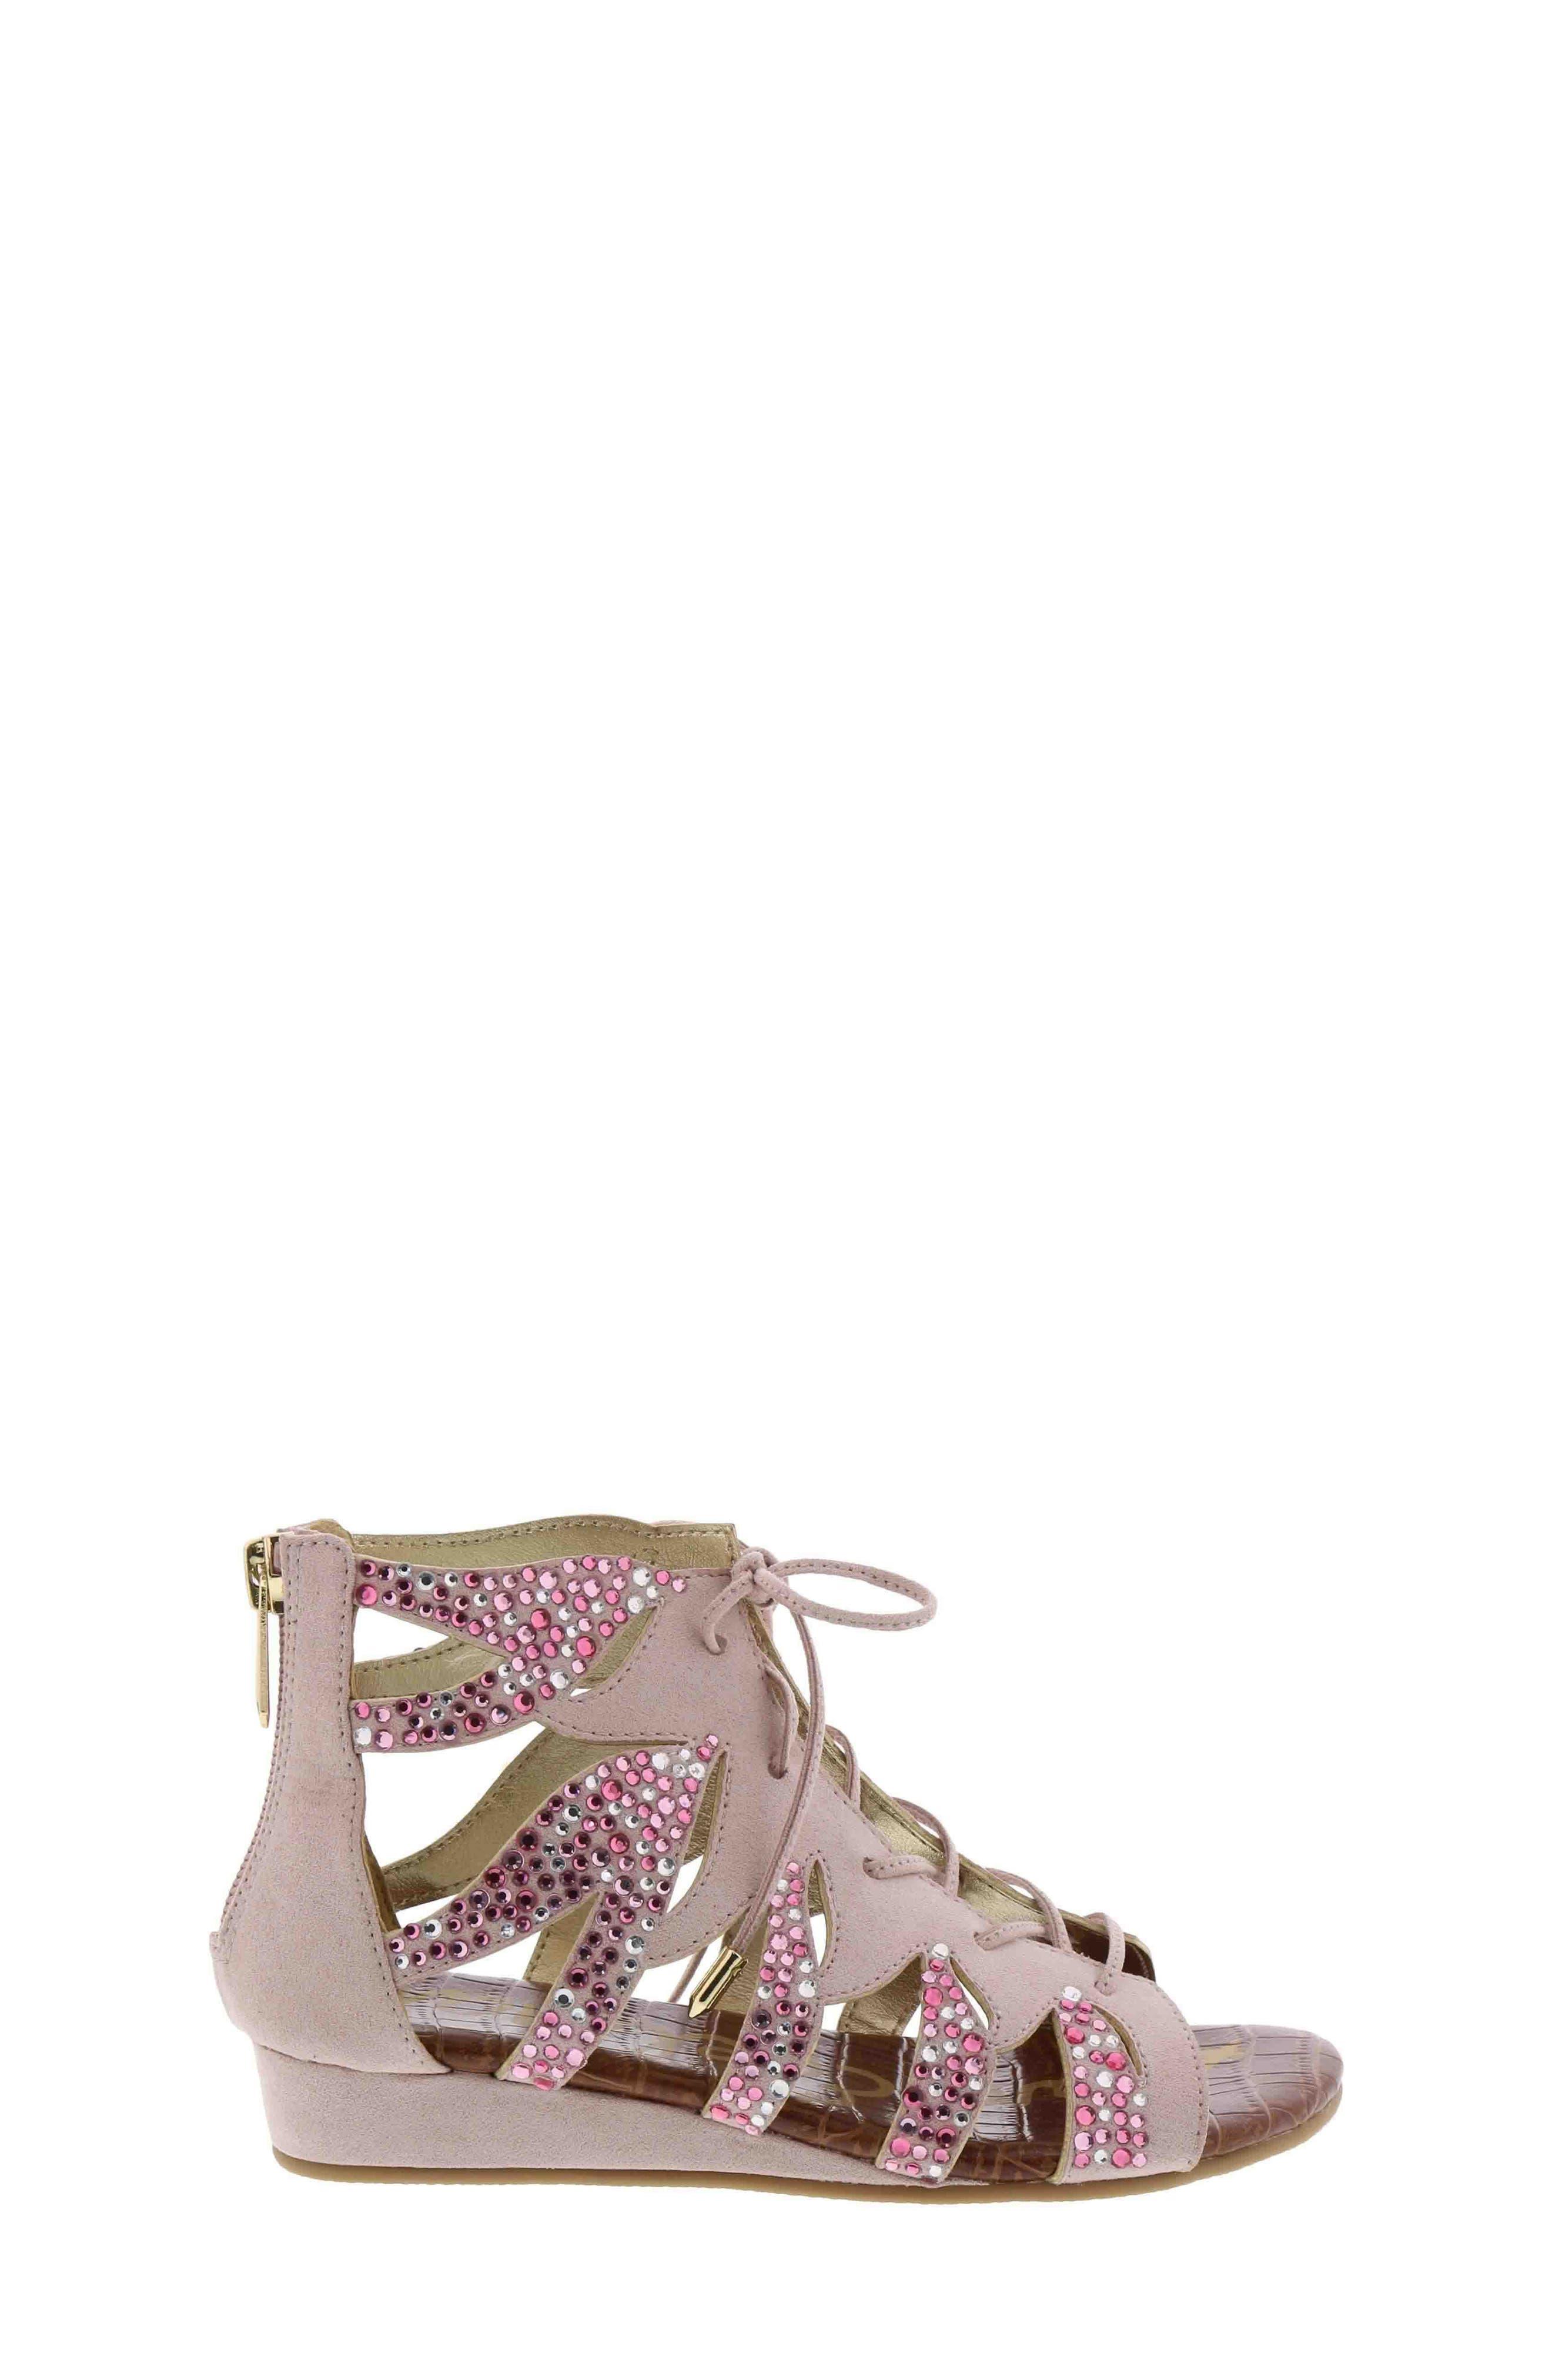 Danica Crystal Embellished Sandal,                         Main,                         color, Blush Faux Suede